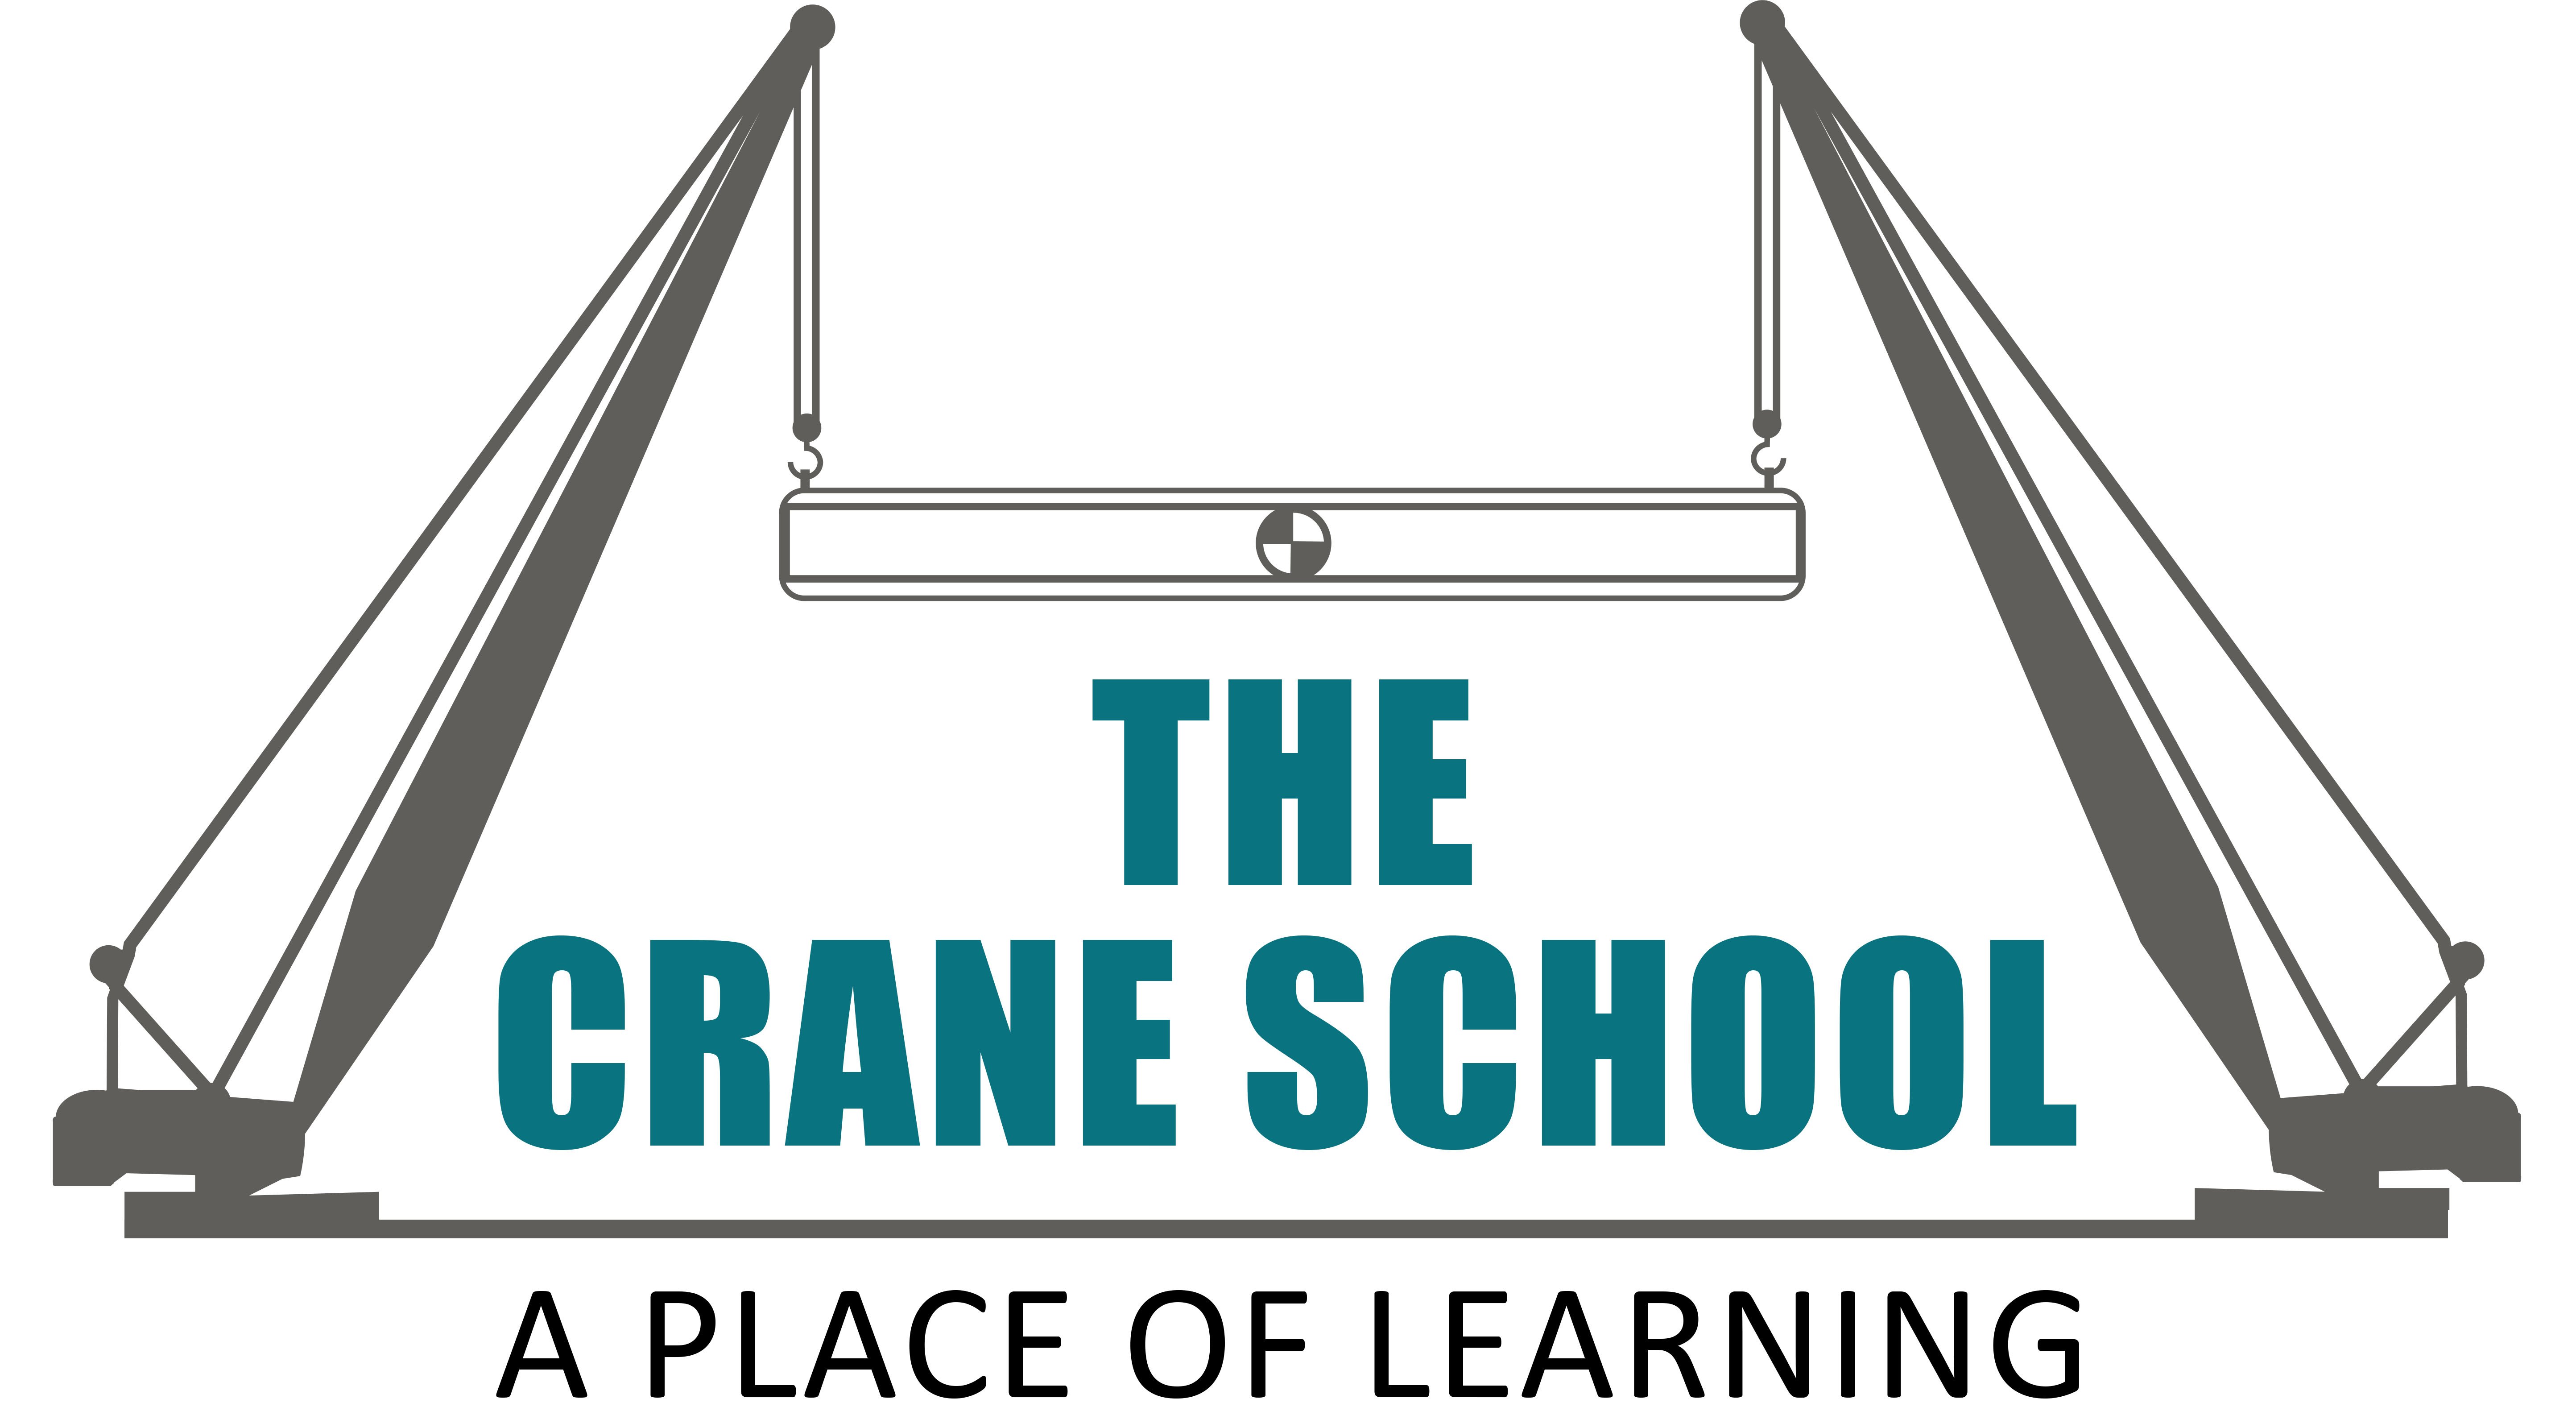 Faq The Crane School